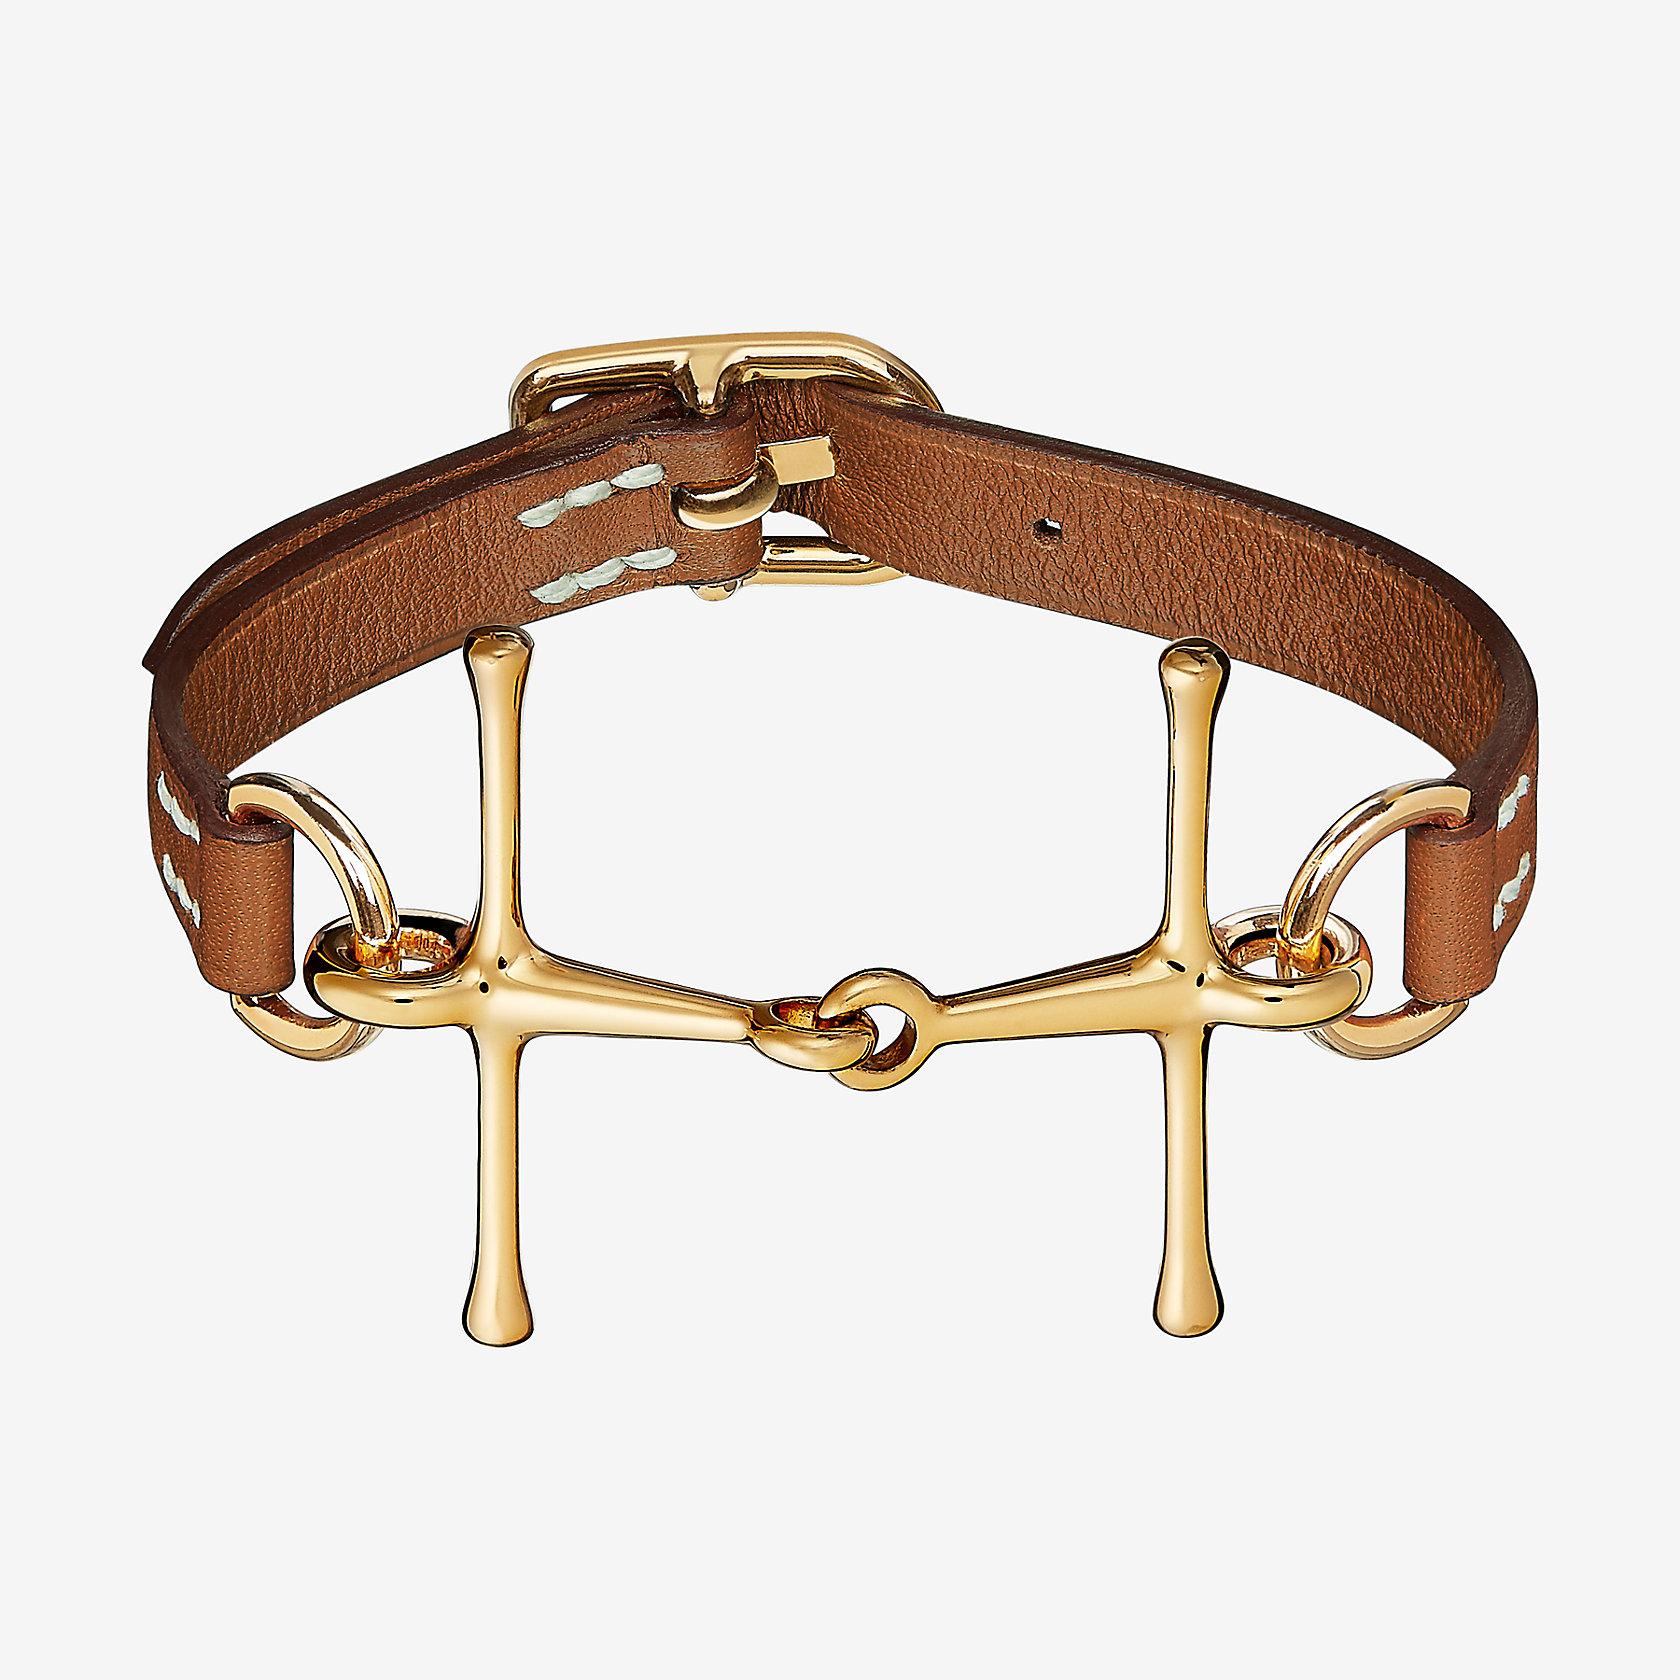 7dad960990e4 Bracelet Mors   Hermès